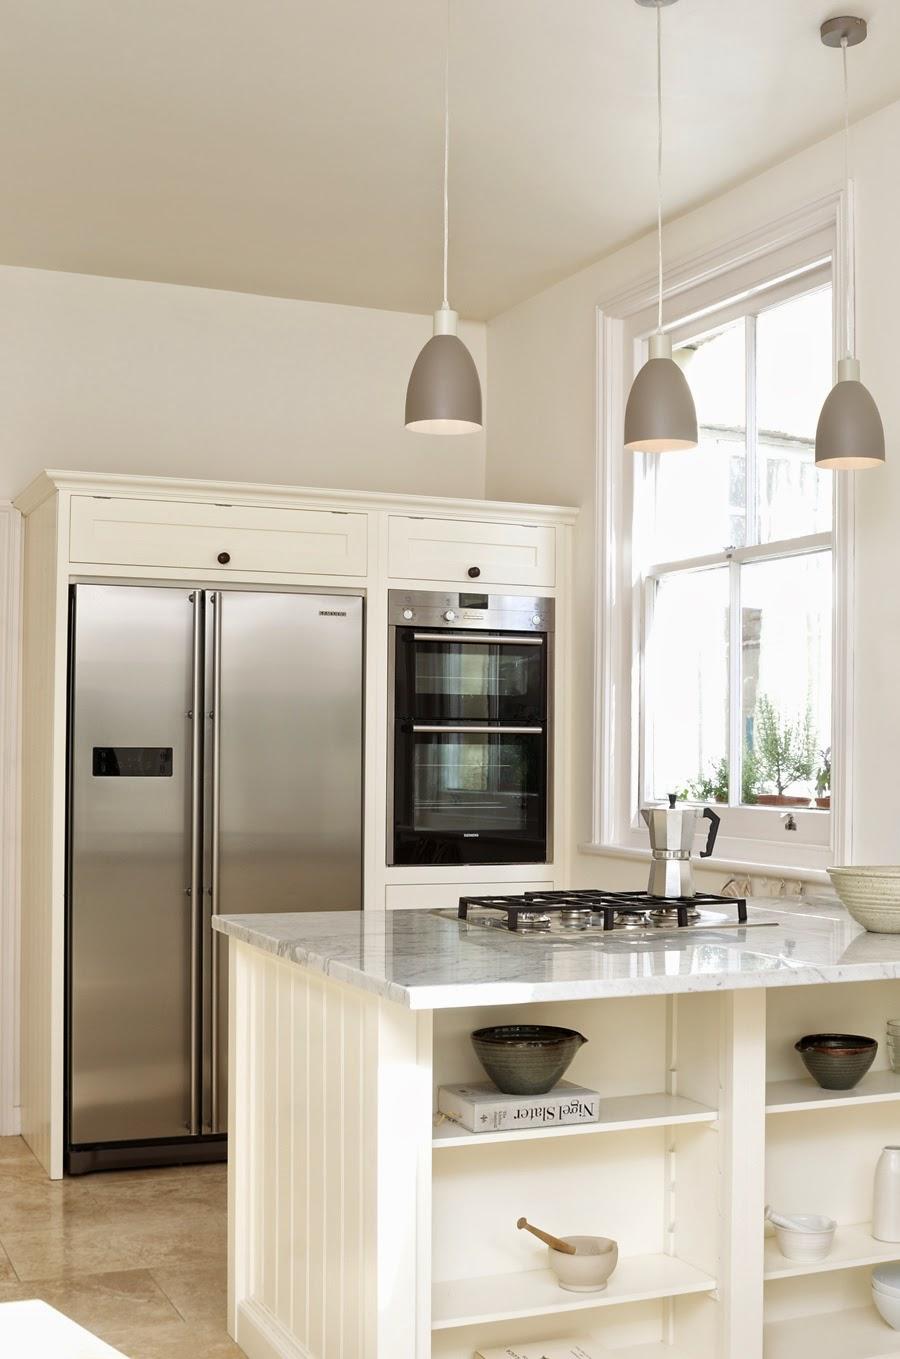 the tunbridge wells shaker kitchen - decorology